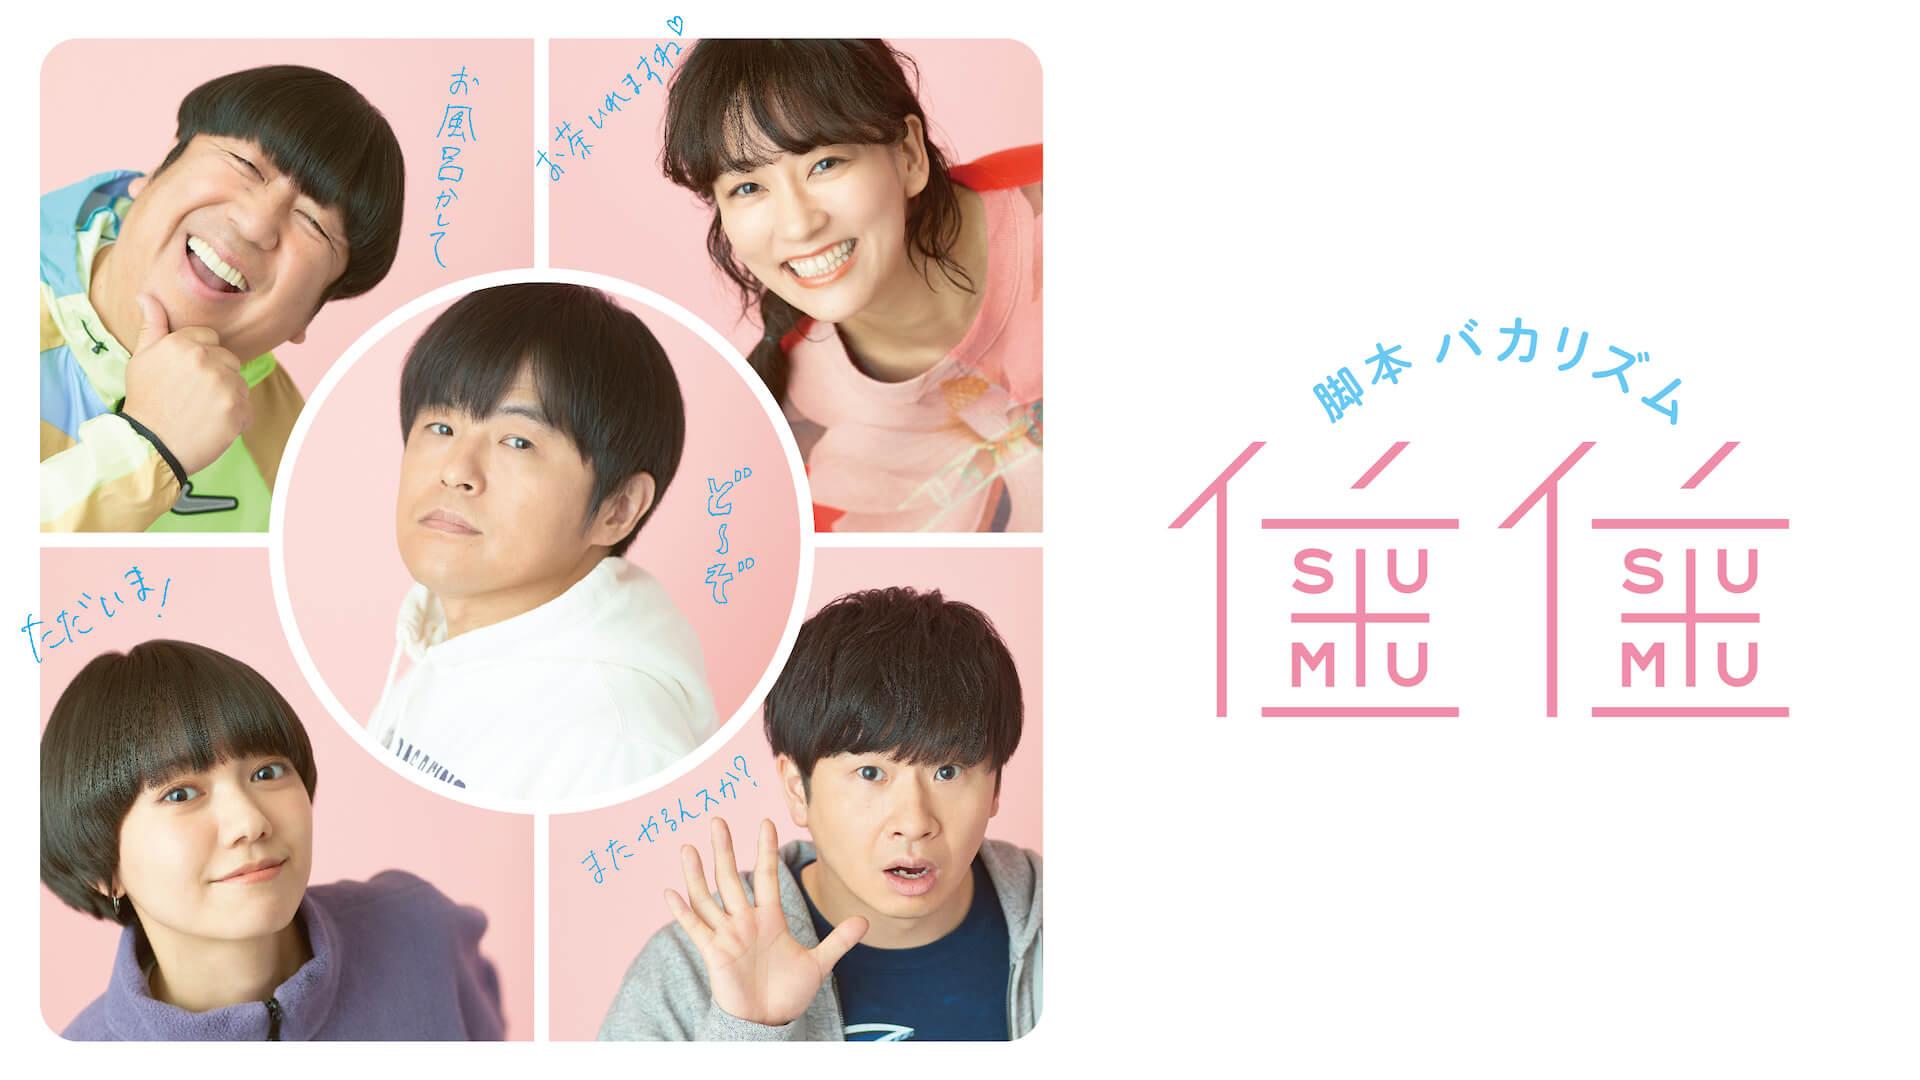 "Kan Sanoの新曲""Natsume""のリリックビデオが本日プレミア公開!直前インスタライブも実施 music210514_kansano_natsume_3"